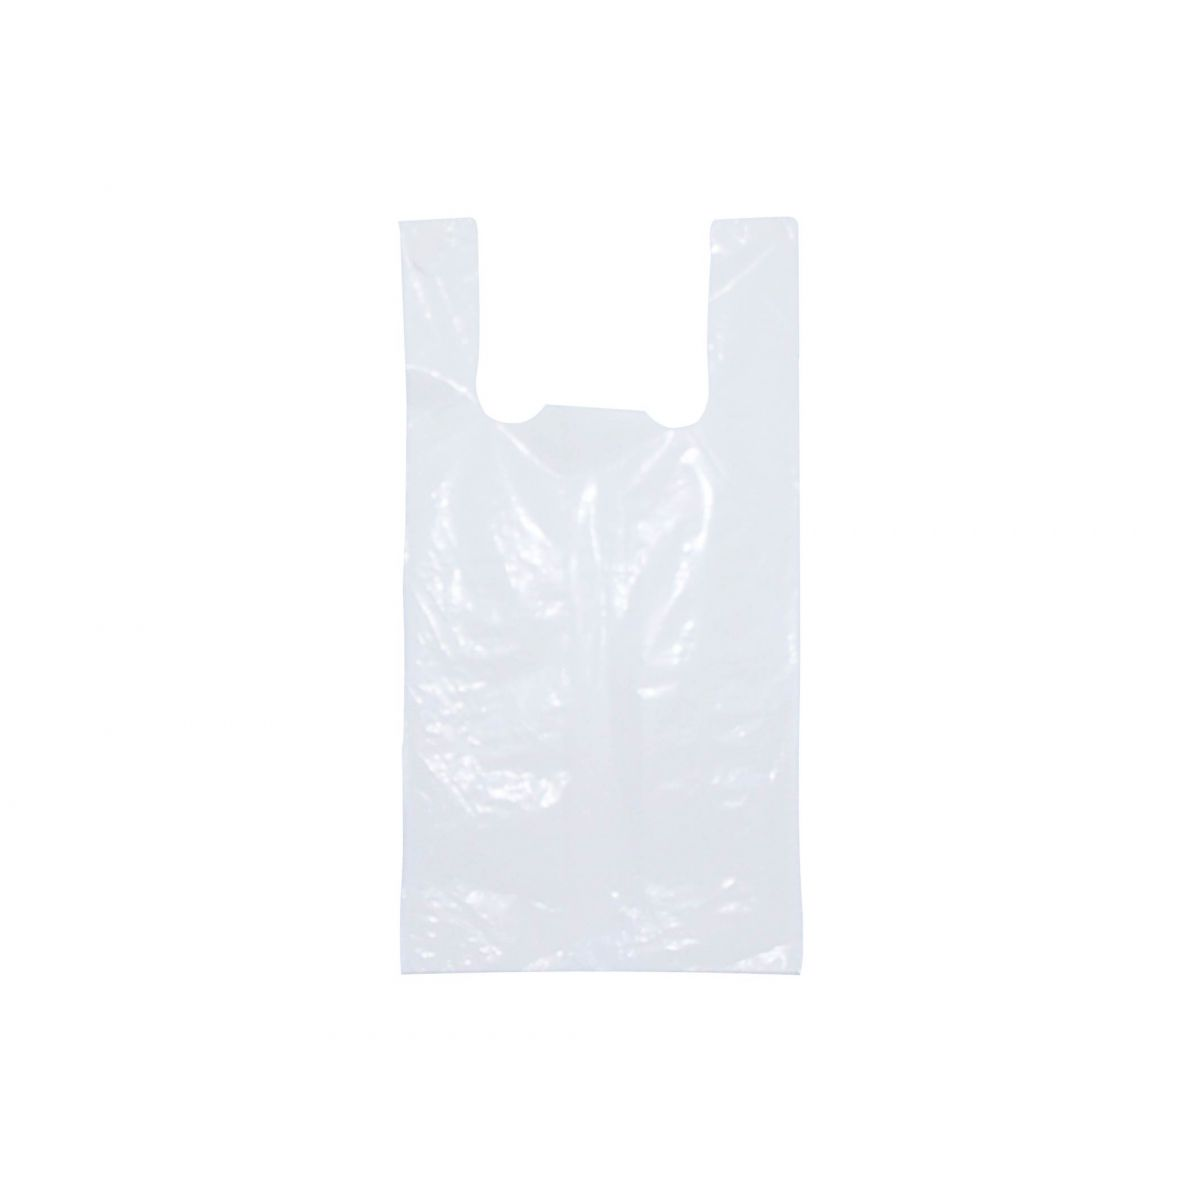 Sacola plástica Branca (espessura fina)- 38x48cm - Pacote 1000 unid